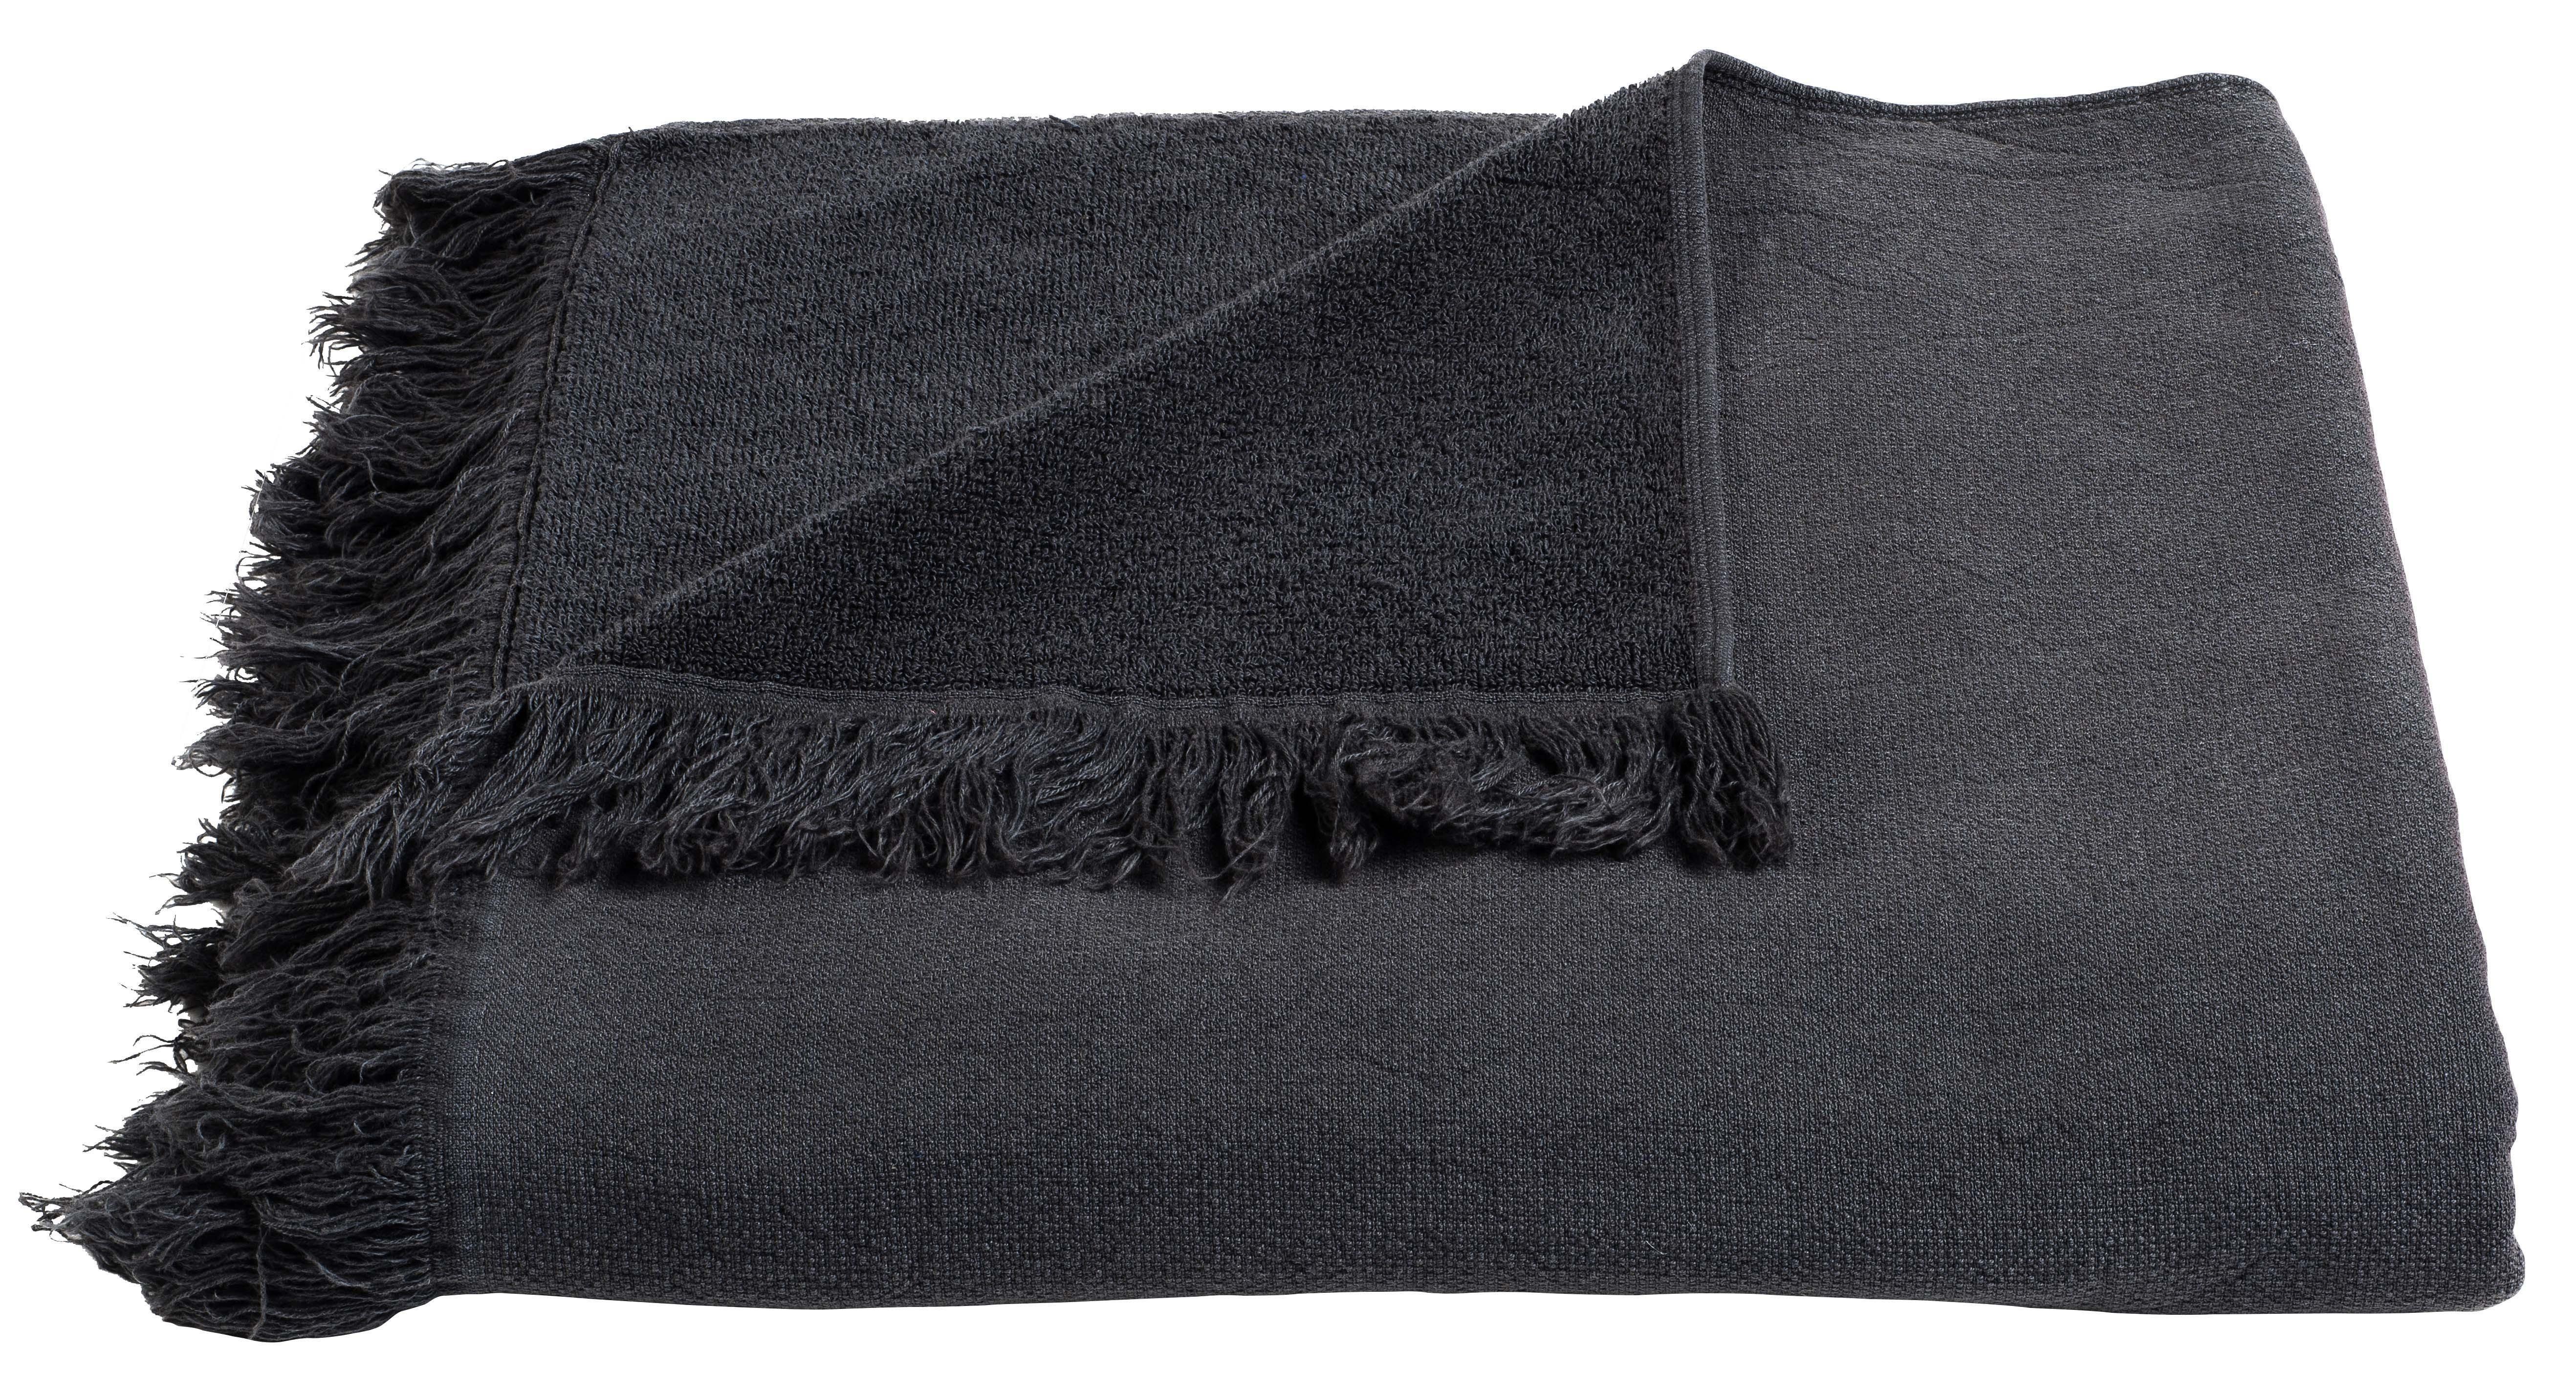 cca624233b6 Bath Towel Luna Black 50 - 100% cotton